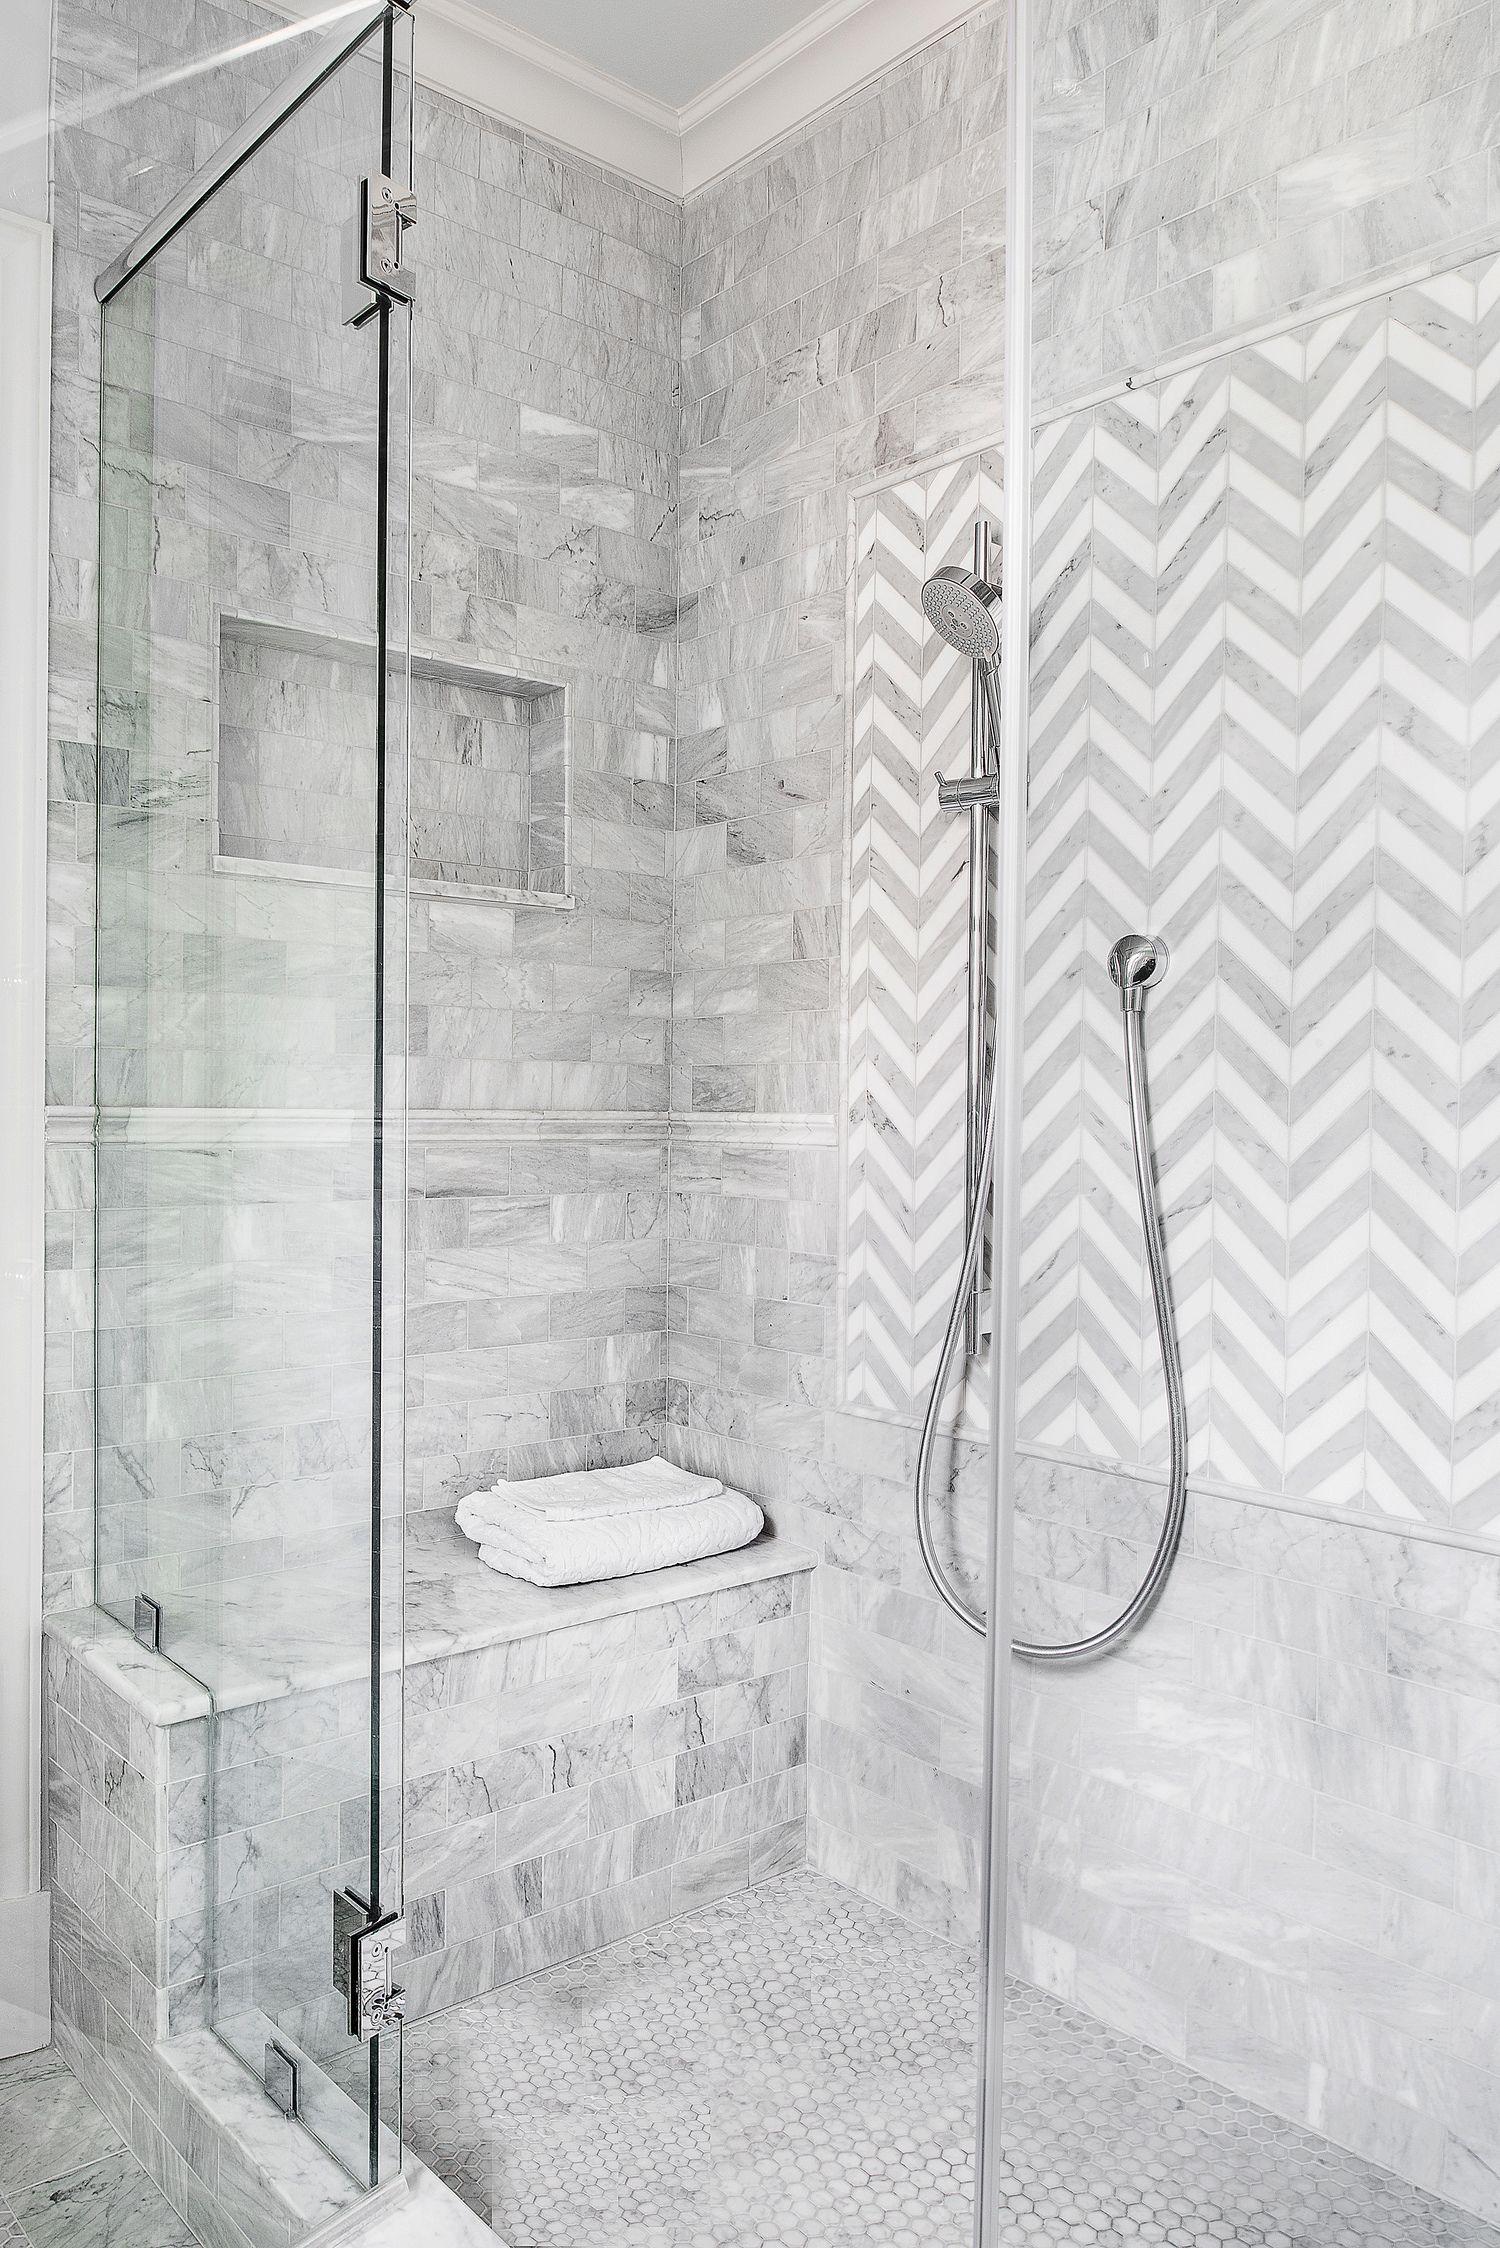 Love This Marble Herringbone Shower Source Marble Tiles Like This From Mandarin Stone Bathroom Remodel Master Bathroom Tile Designs Patterned Bathroom Tiles